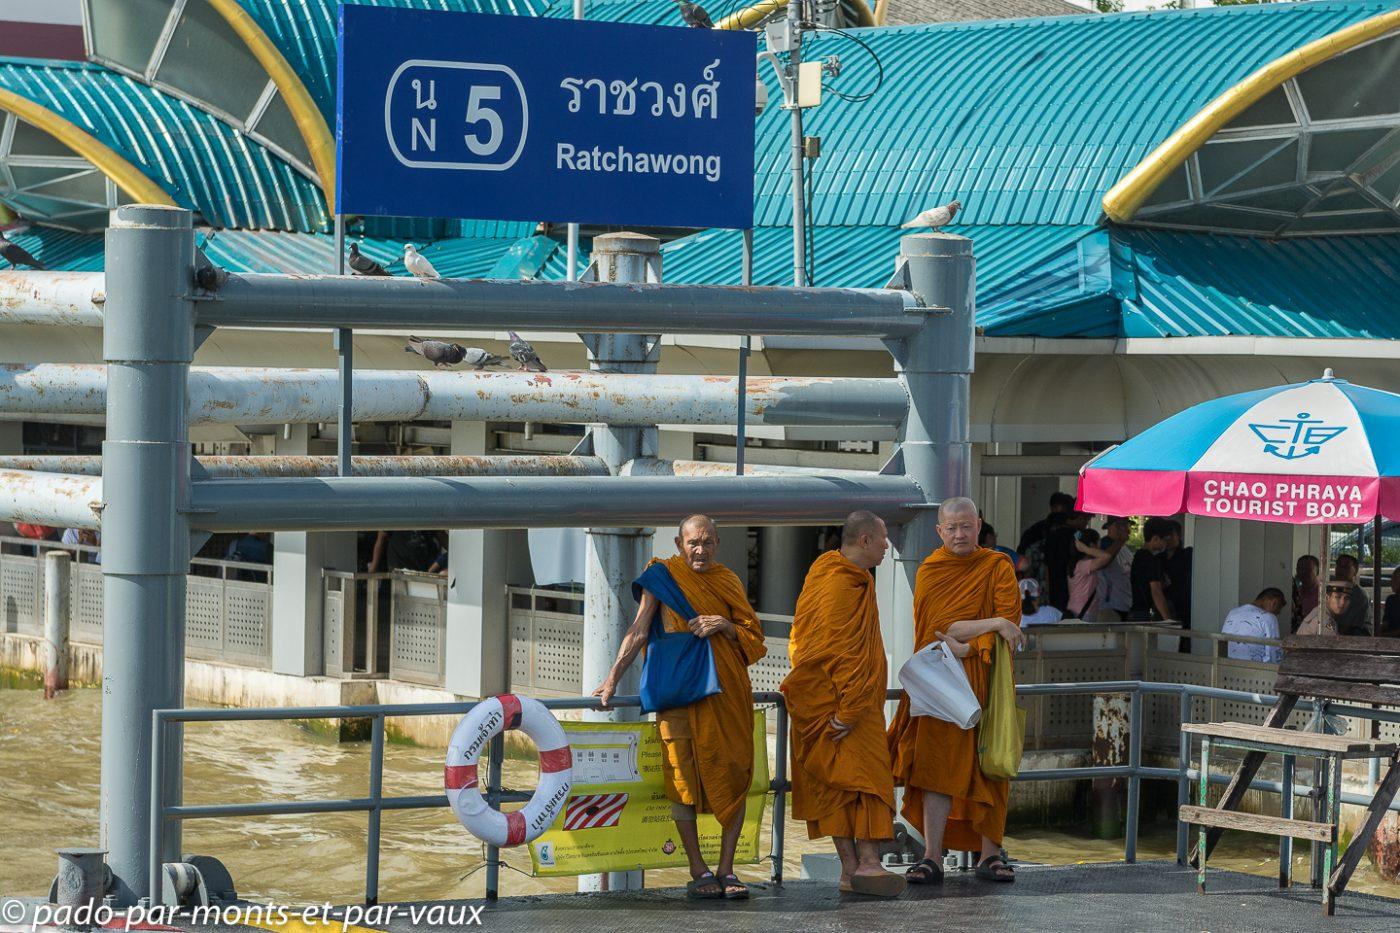 Sur le Chao Phraya